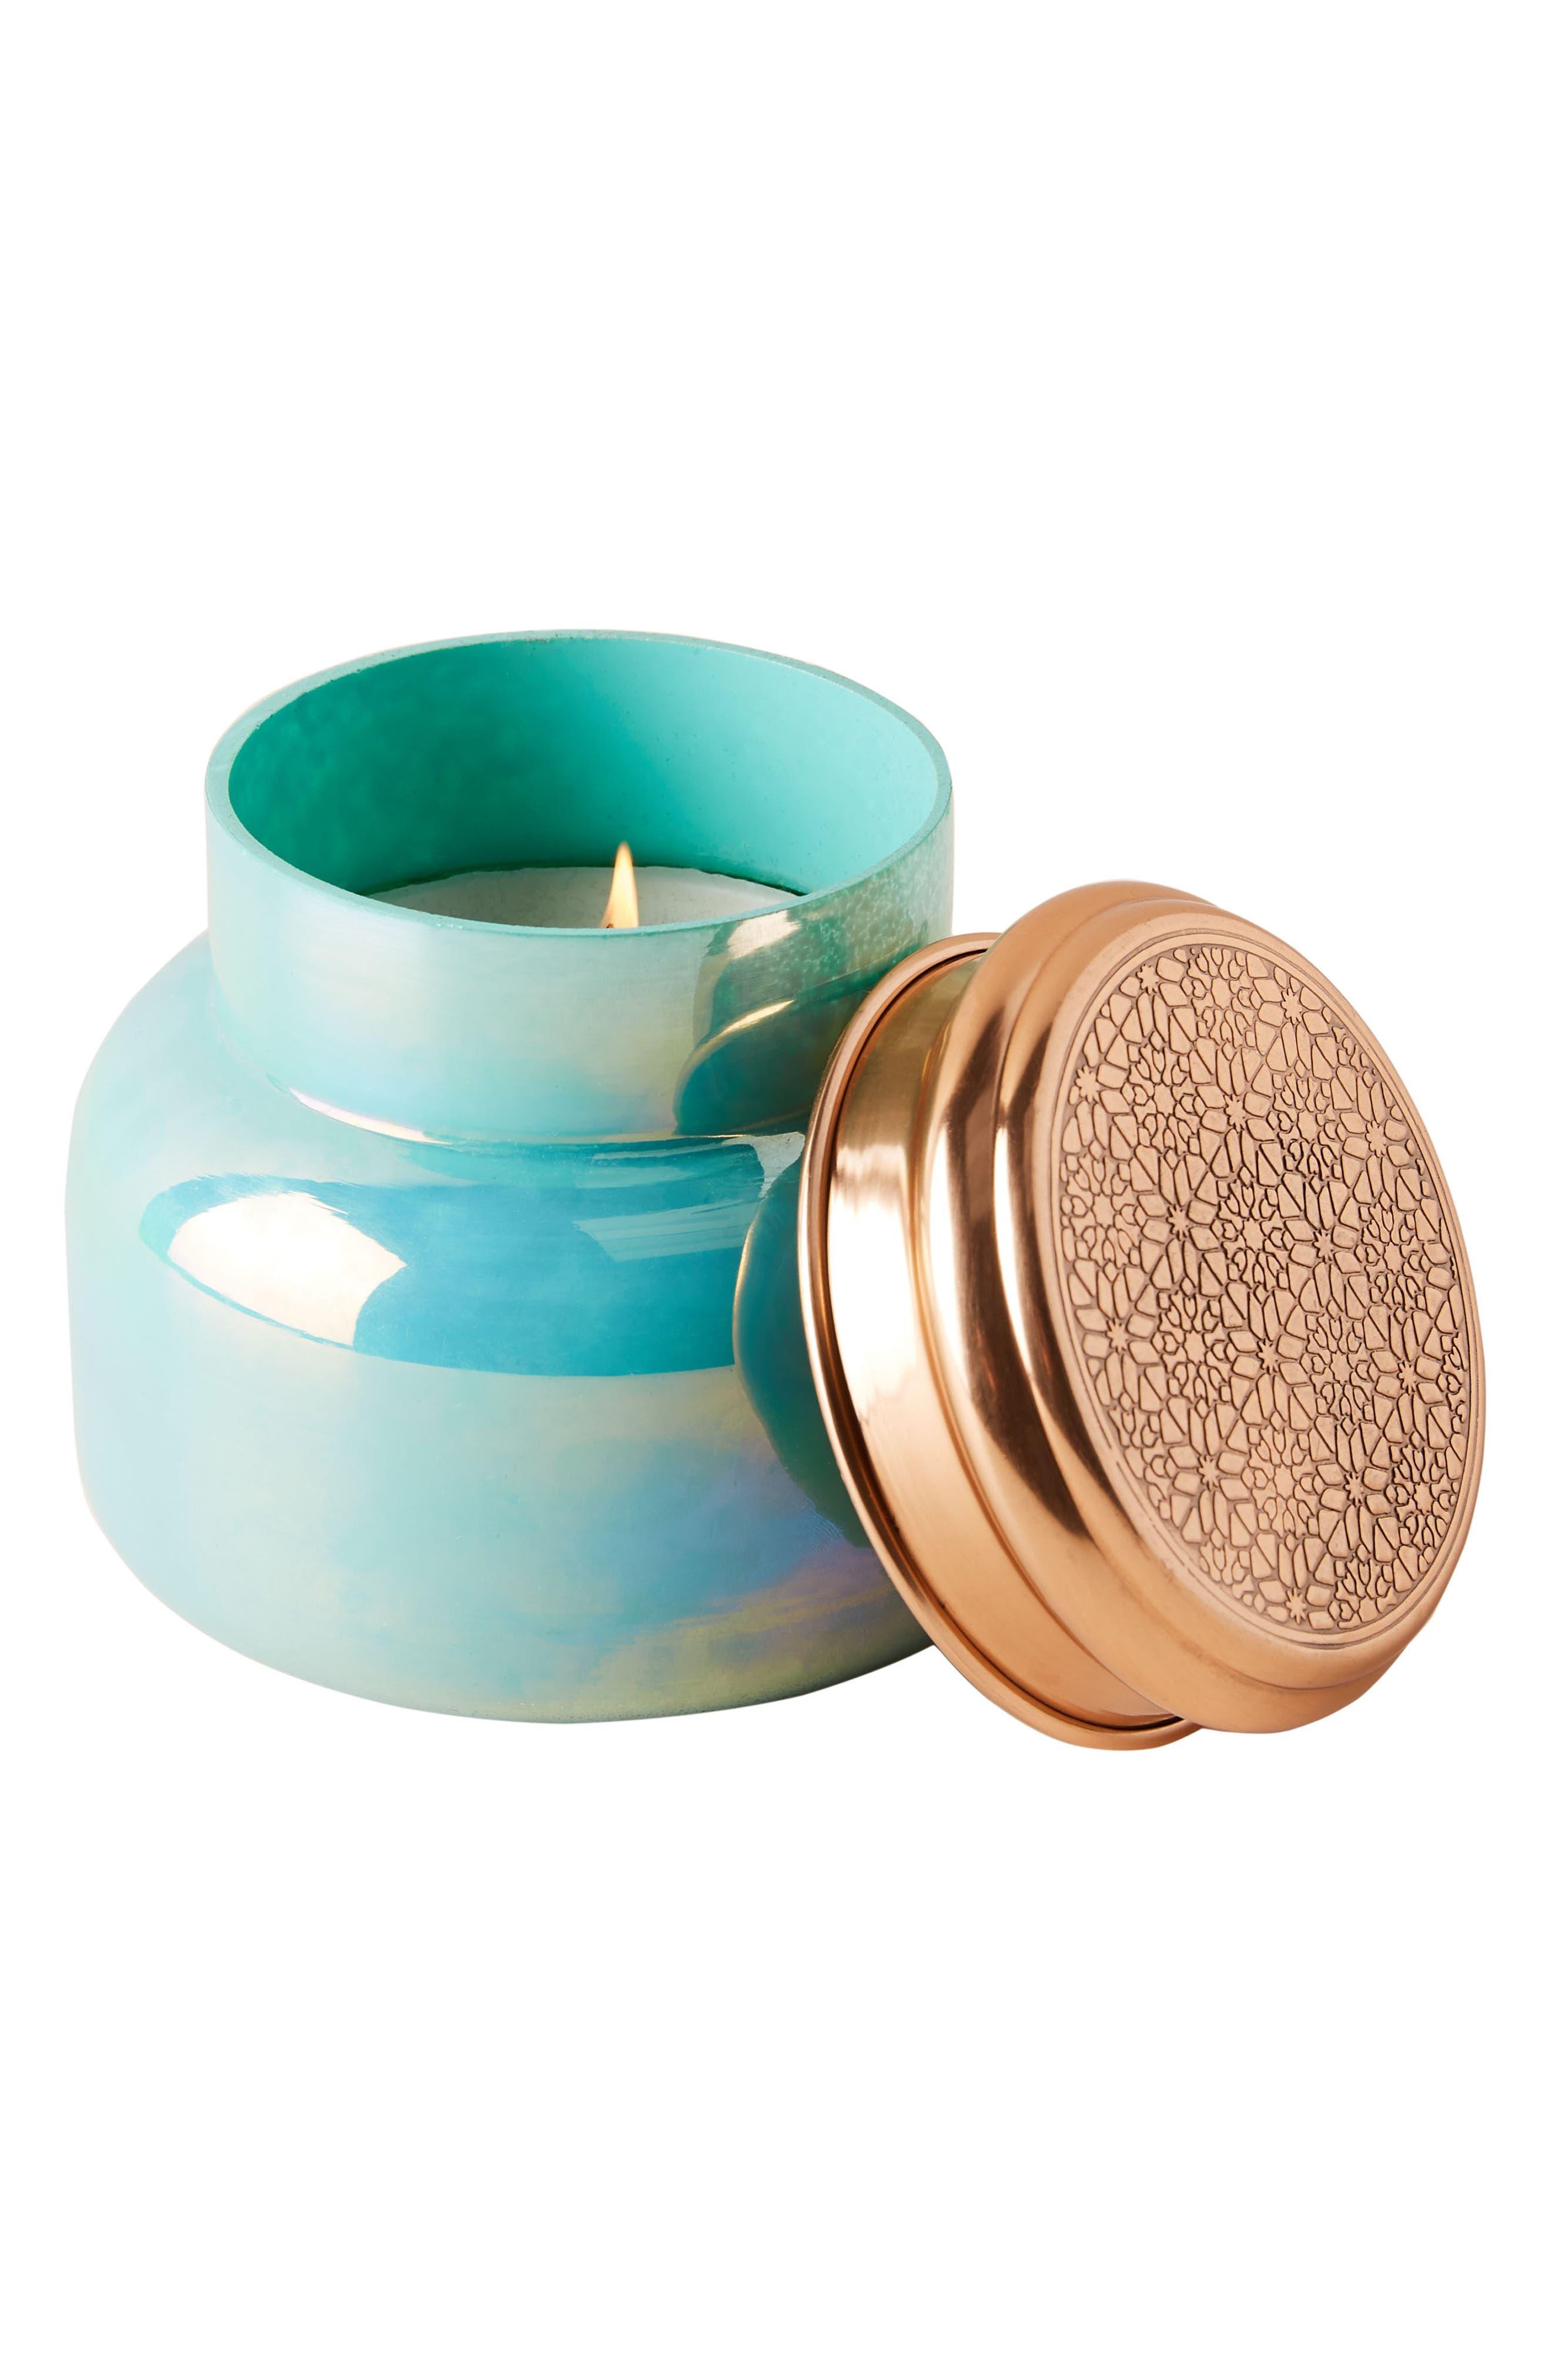 Turquoise Opal Jar Candle,                             Alternate thumbnail 3, color,                             LOLA BLOSSOM